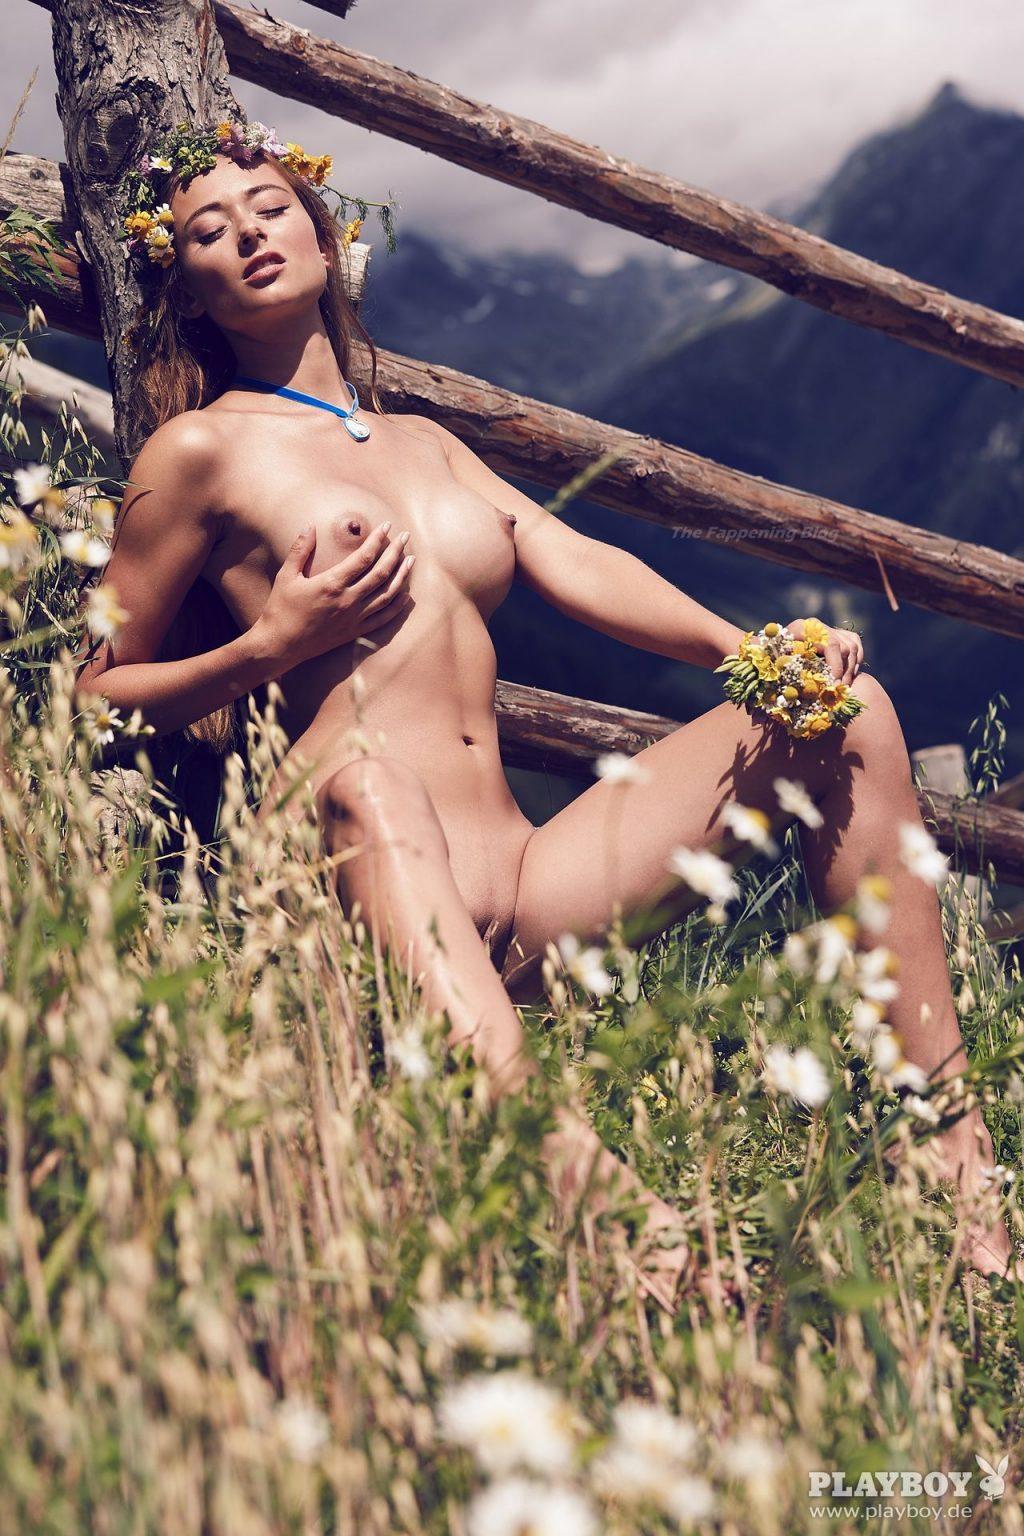 Kühne nude jessica Hot !